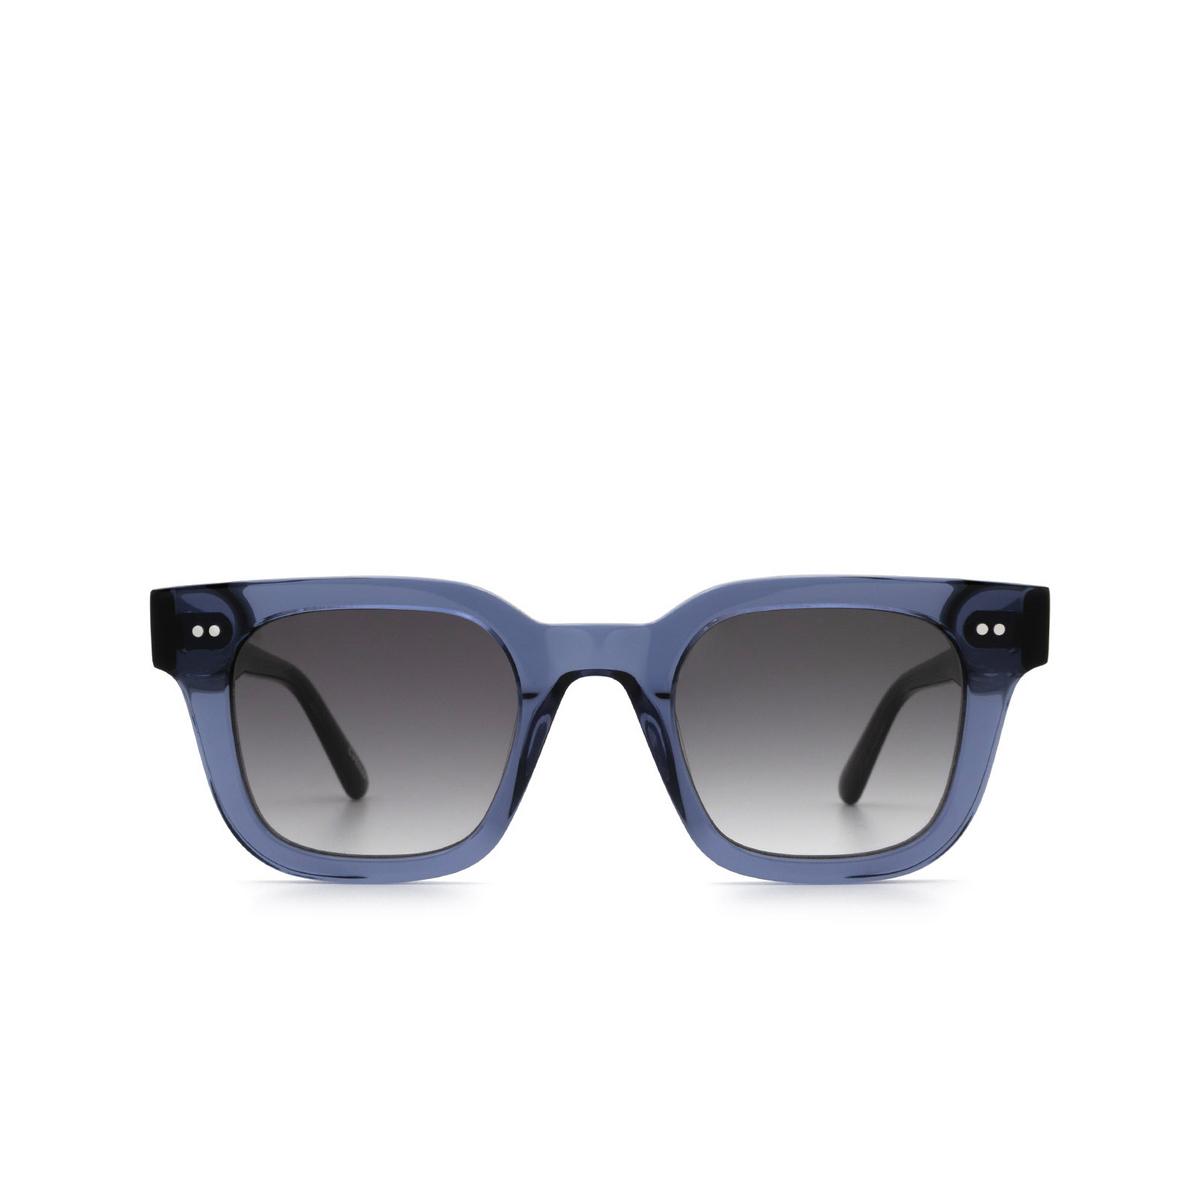 Chimi® Square Sunglasses: 04 color Blue - front view.